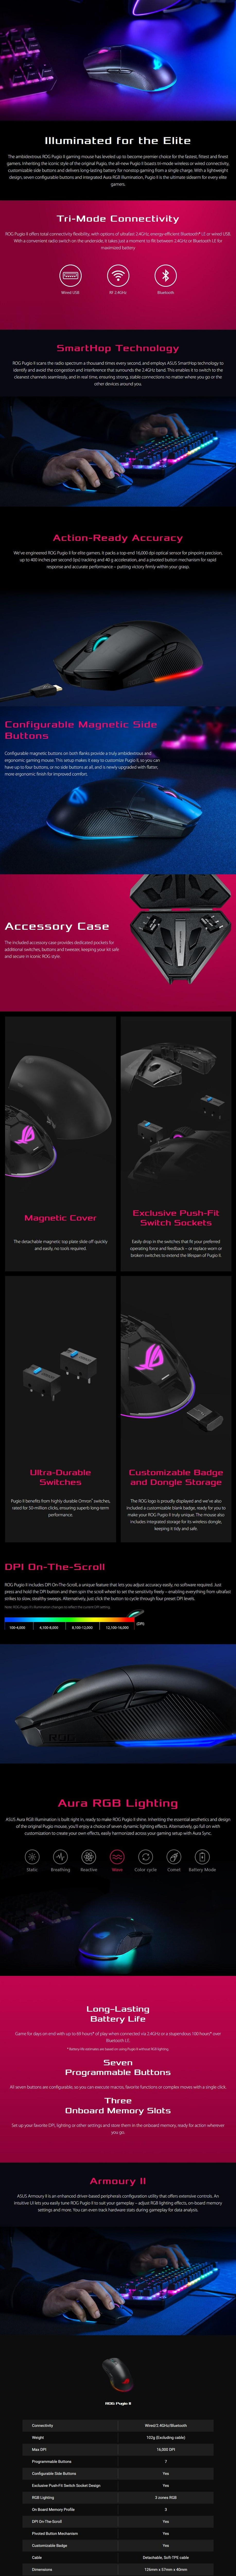 asus rog pugio ii rgb ambidextrous lightweight wireless gaming mouse